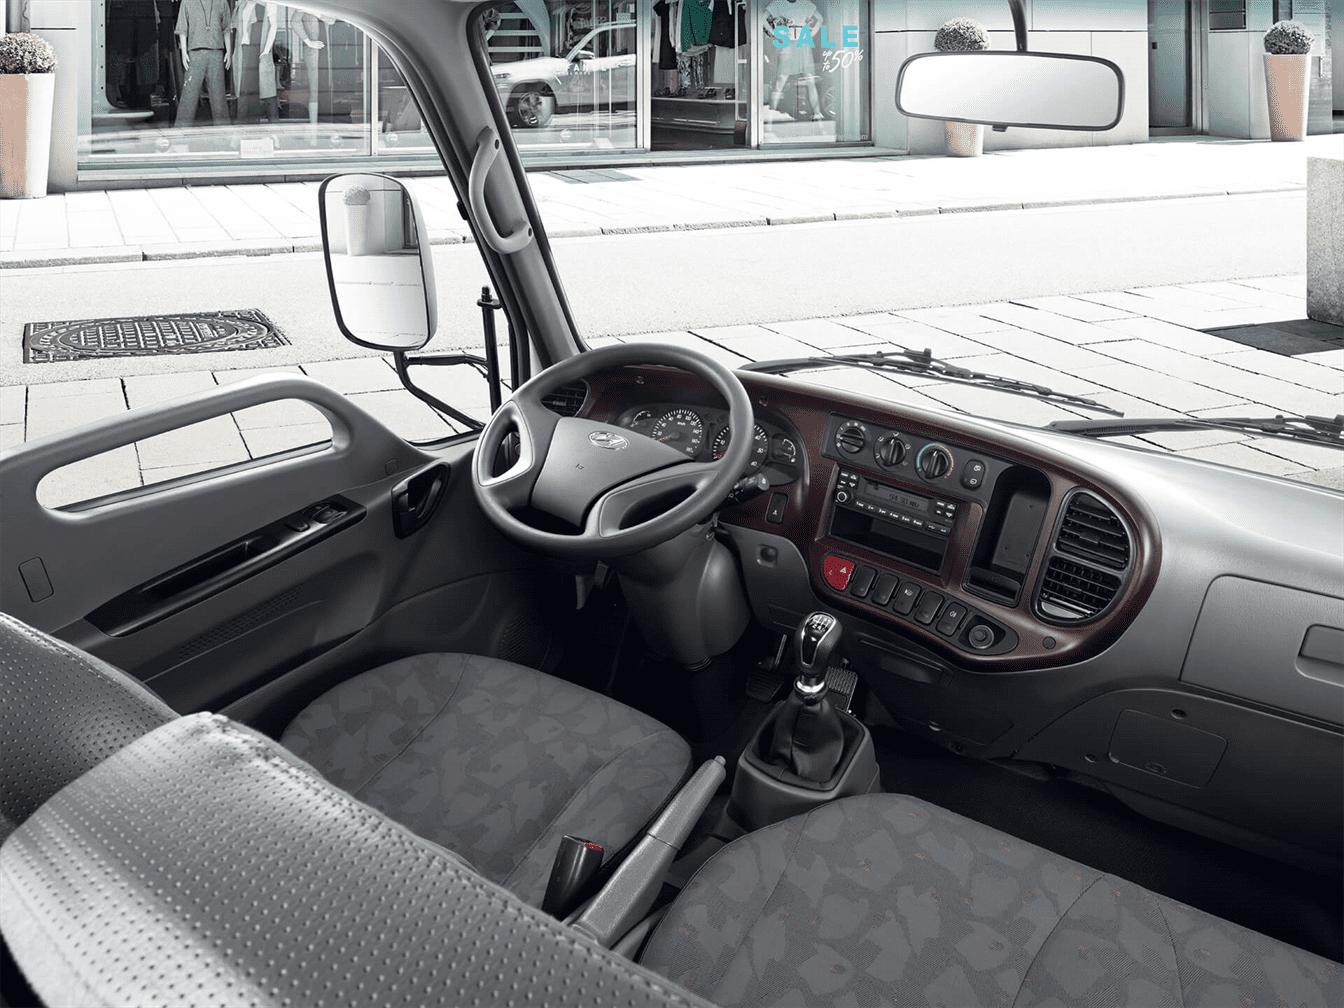 nội thất xe tải n250sl